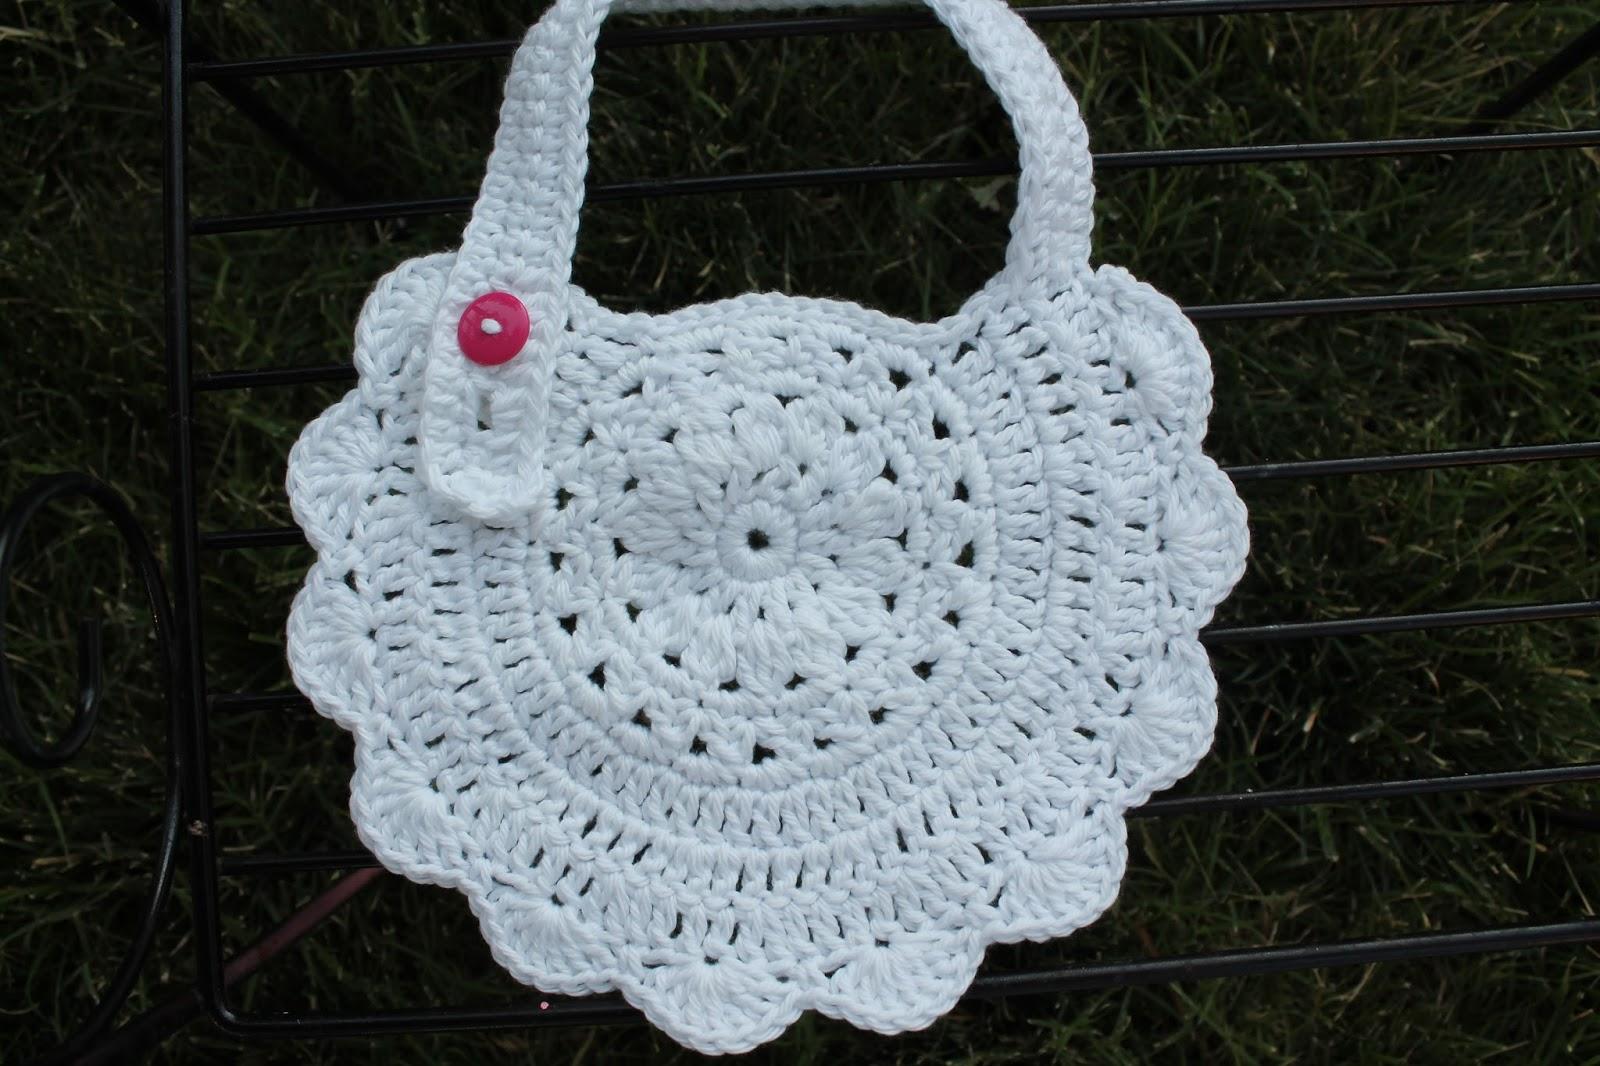 Crochet Cotton Baby Bib Pattern : Mi Casa: Crochet Baby Bibs